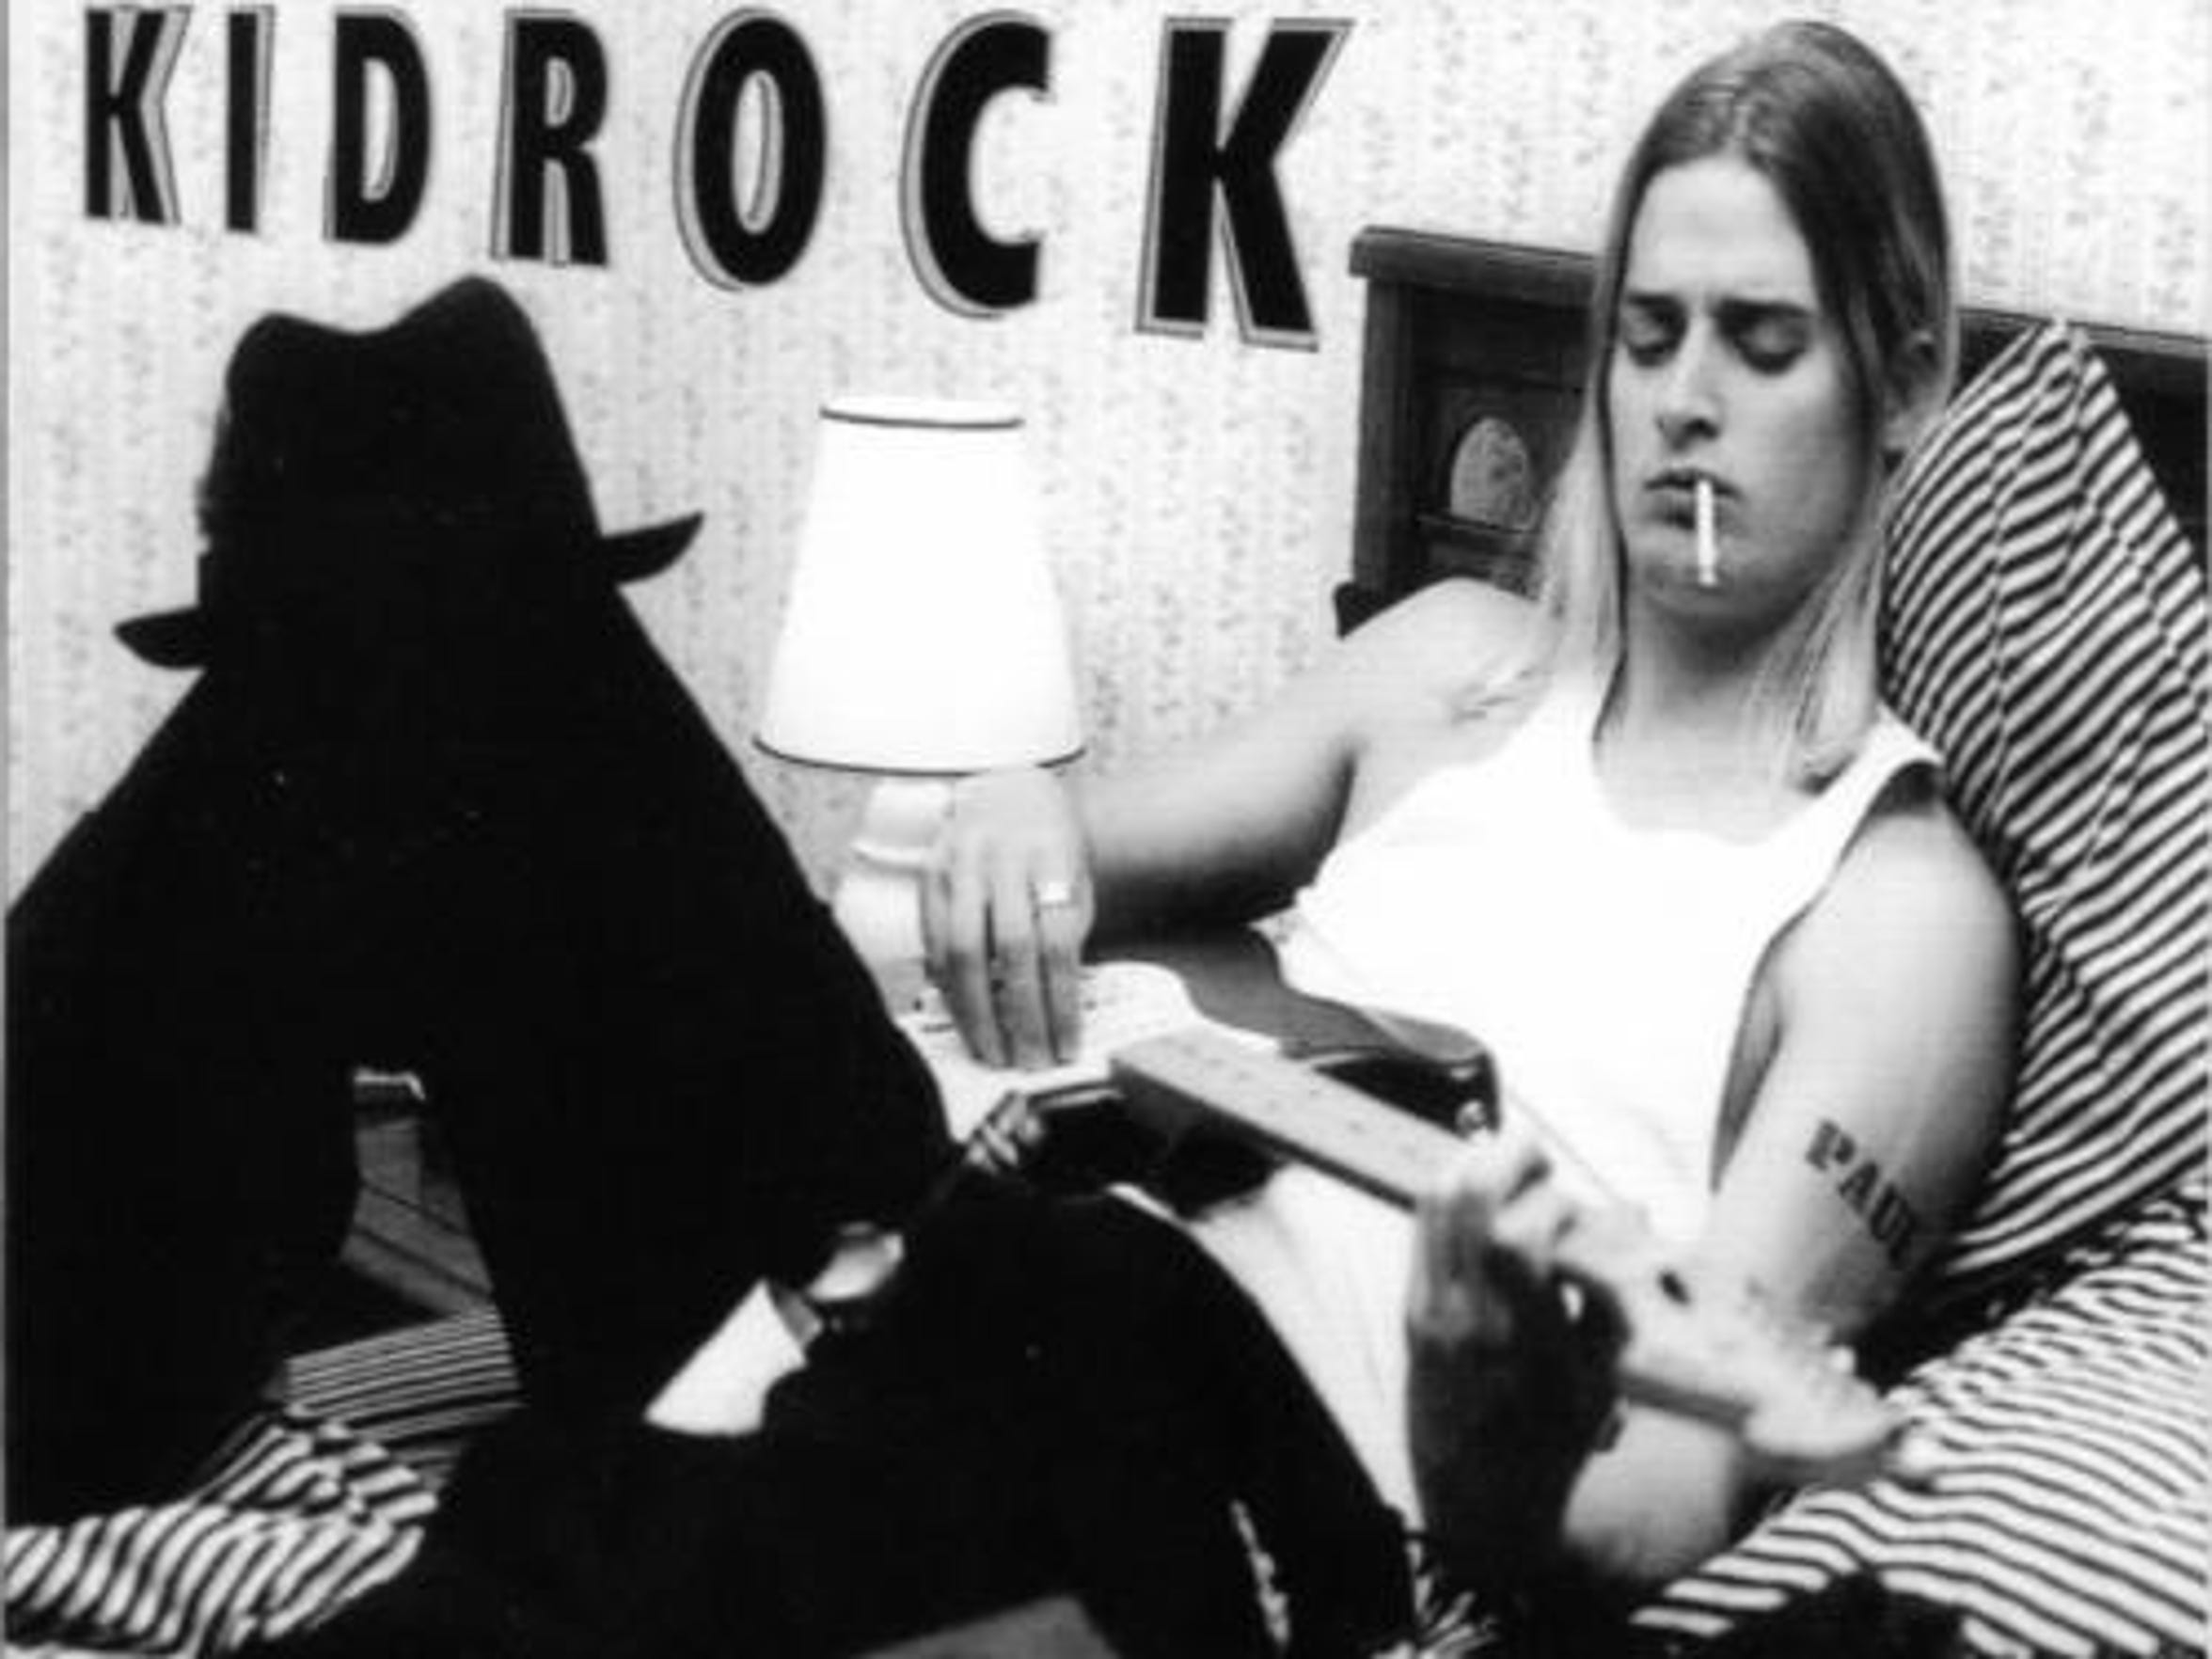 Kid Rock Early Mornin Stoned Pimp Video